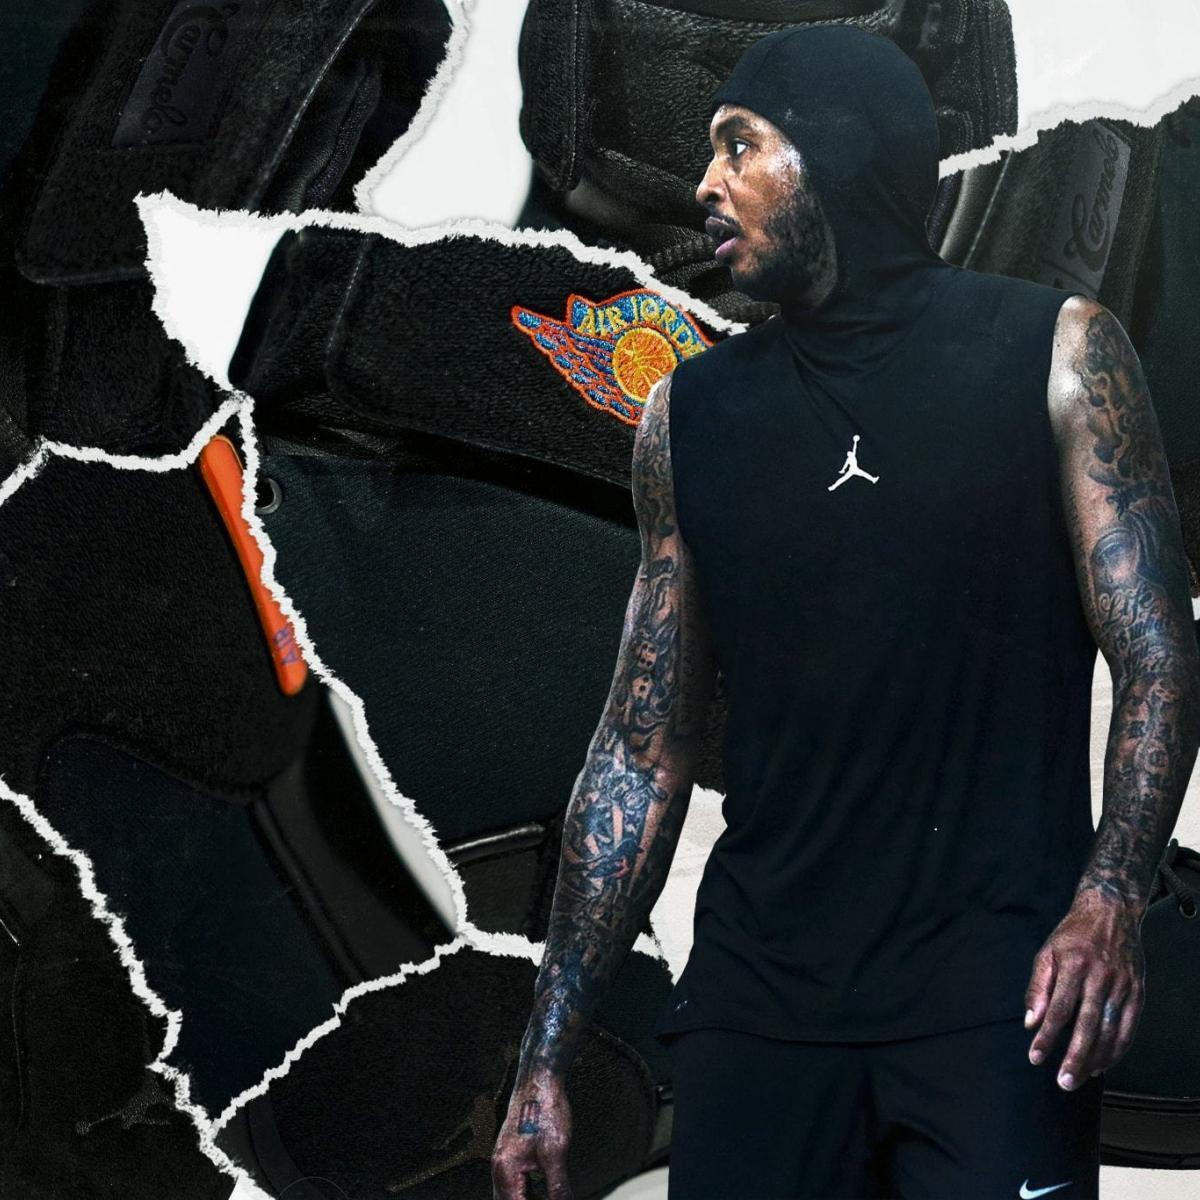 902f8c17ee31 B R Kicks Exclusive  Carmelo Anthony s Return to the Jordan Melo 1.5 ...